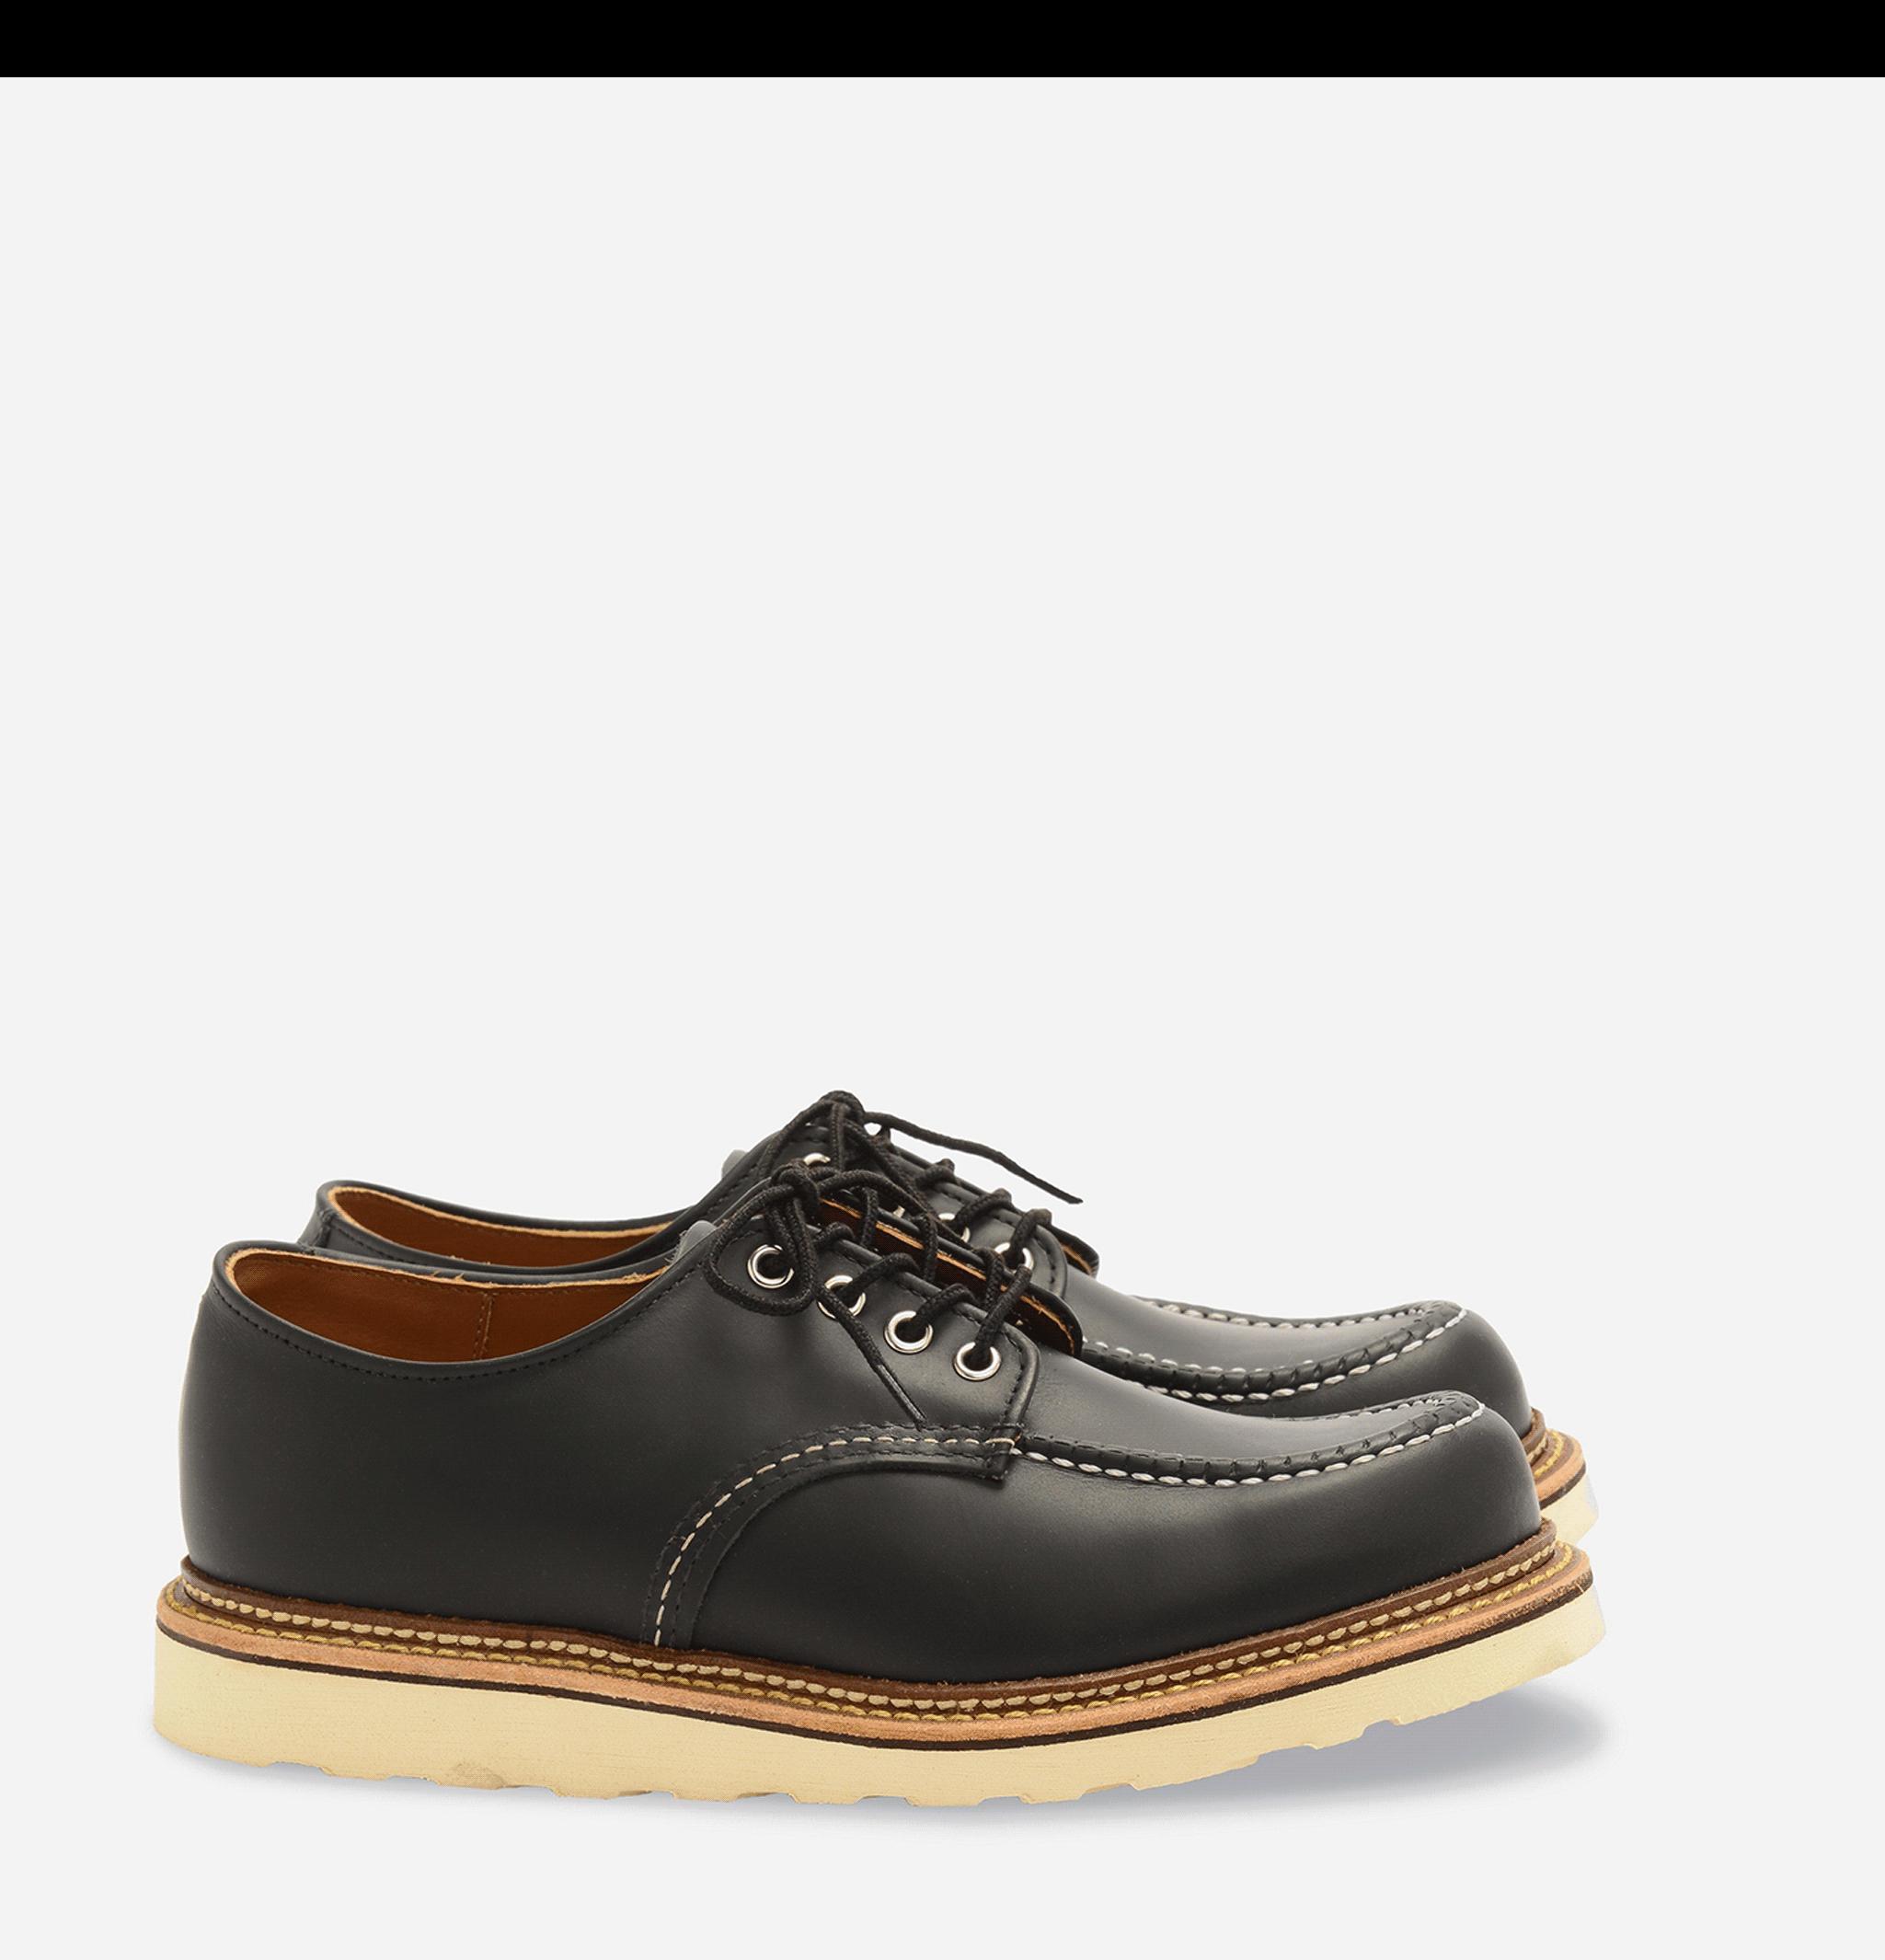 8106 - Oxford Black